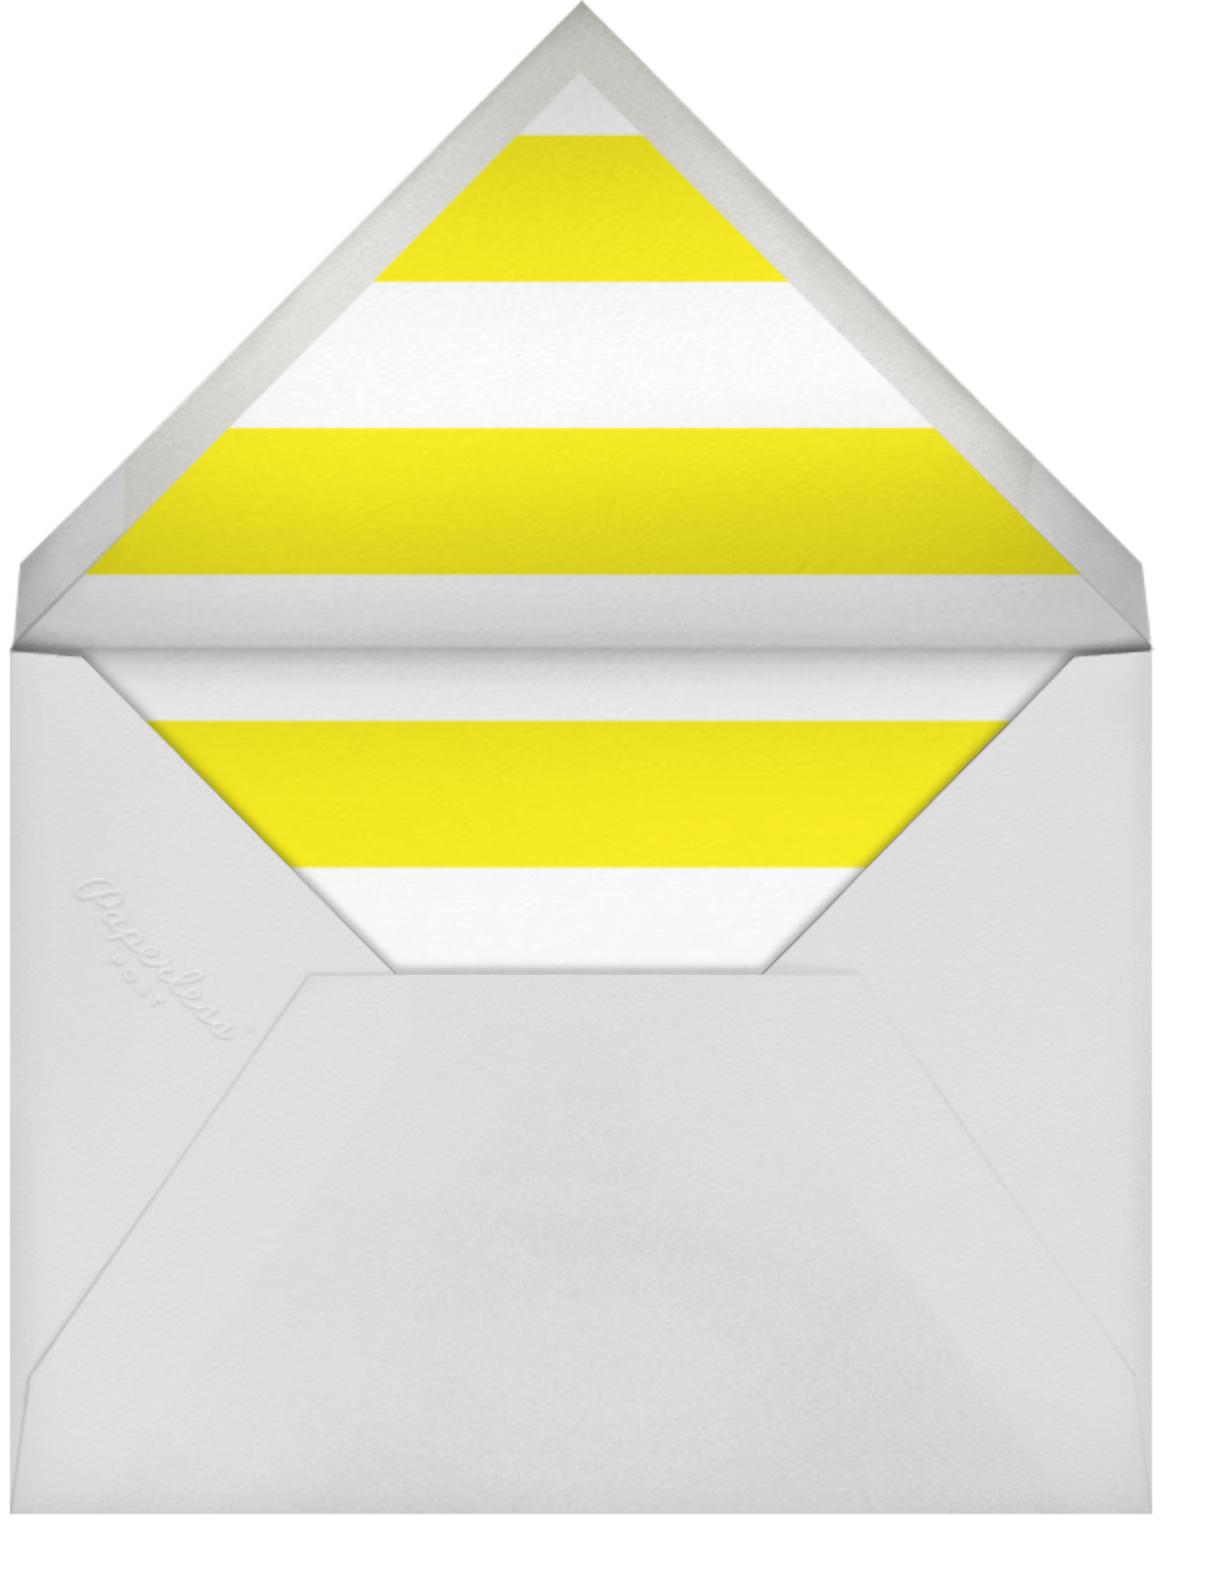 Stripe Suite (Stationery) - Yellow - kate spade new york - Envelope